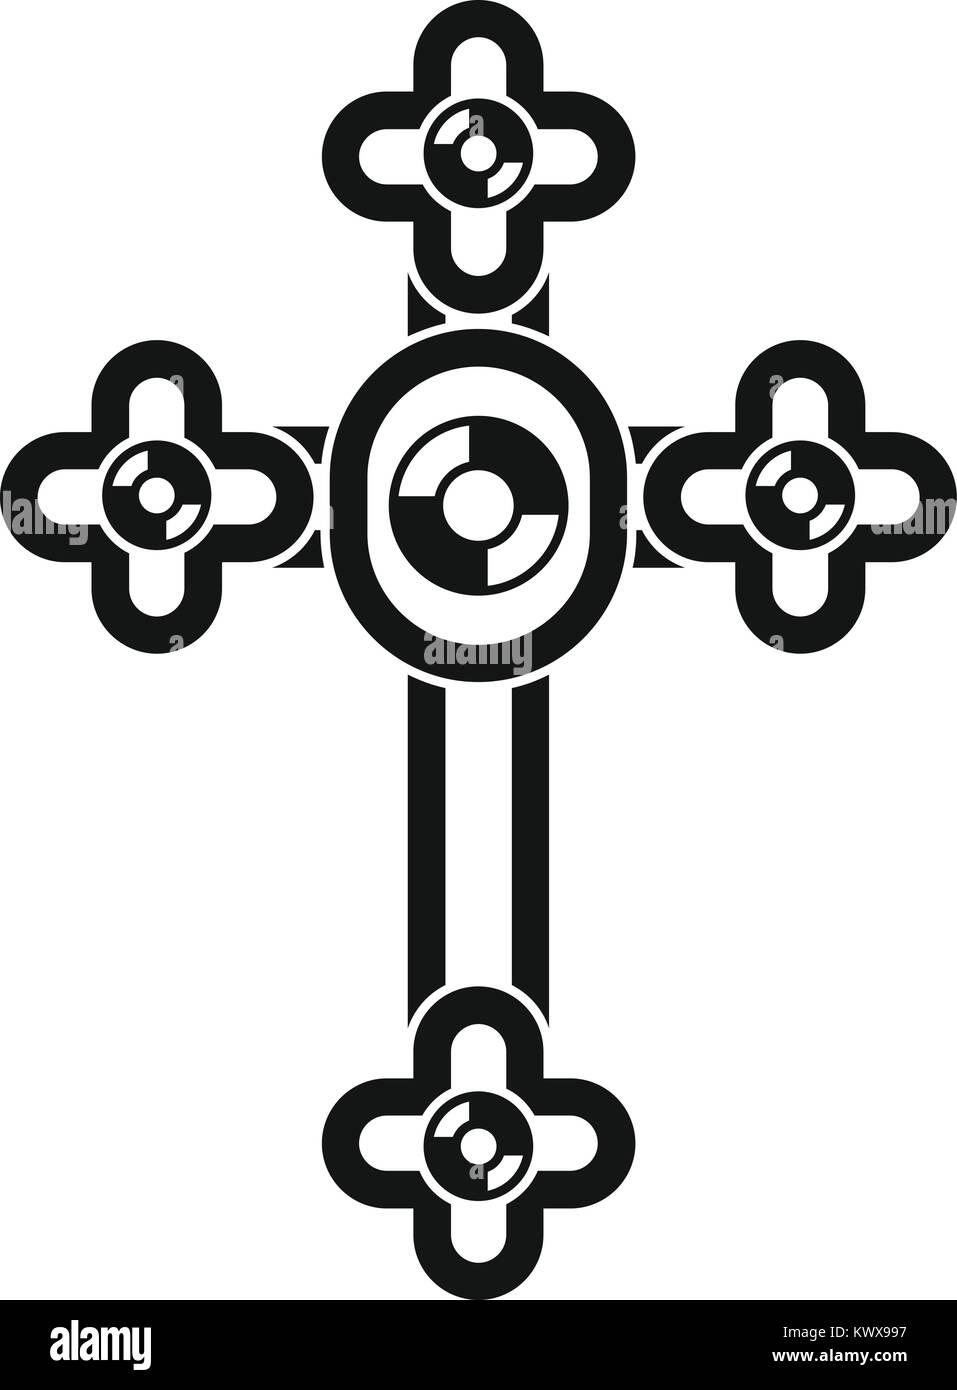 Cross with diamonds icon, simple style - Stock Image